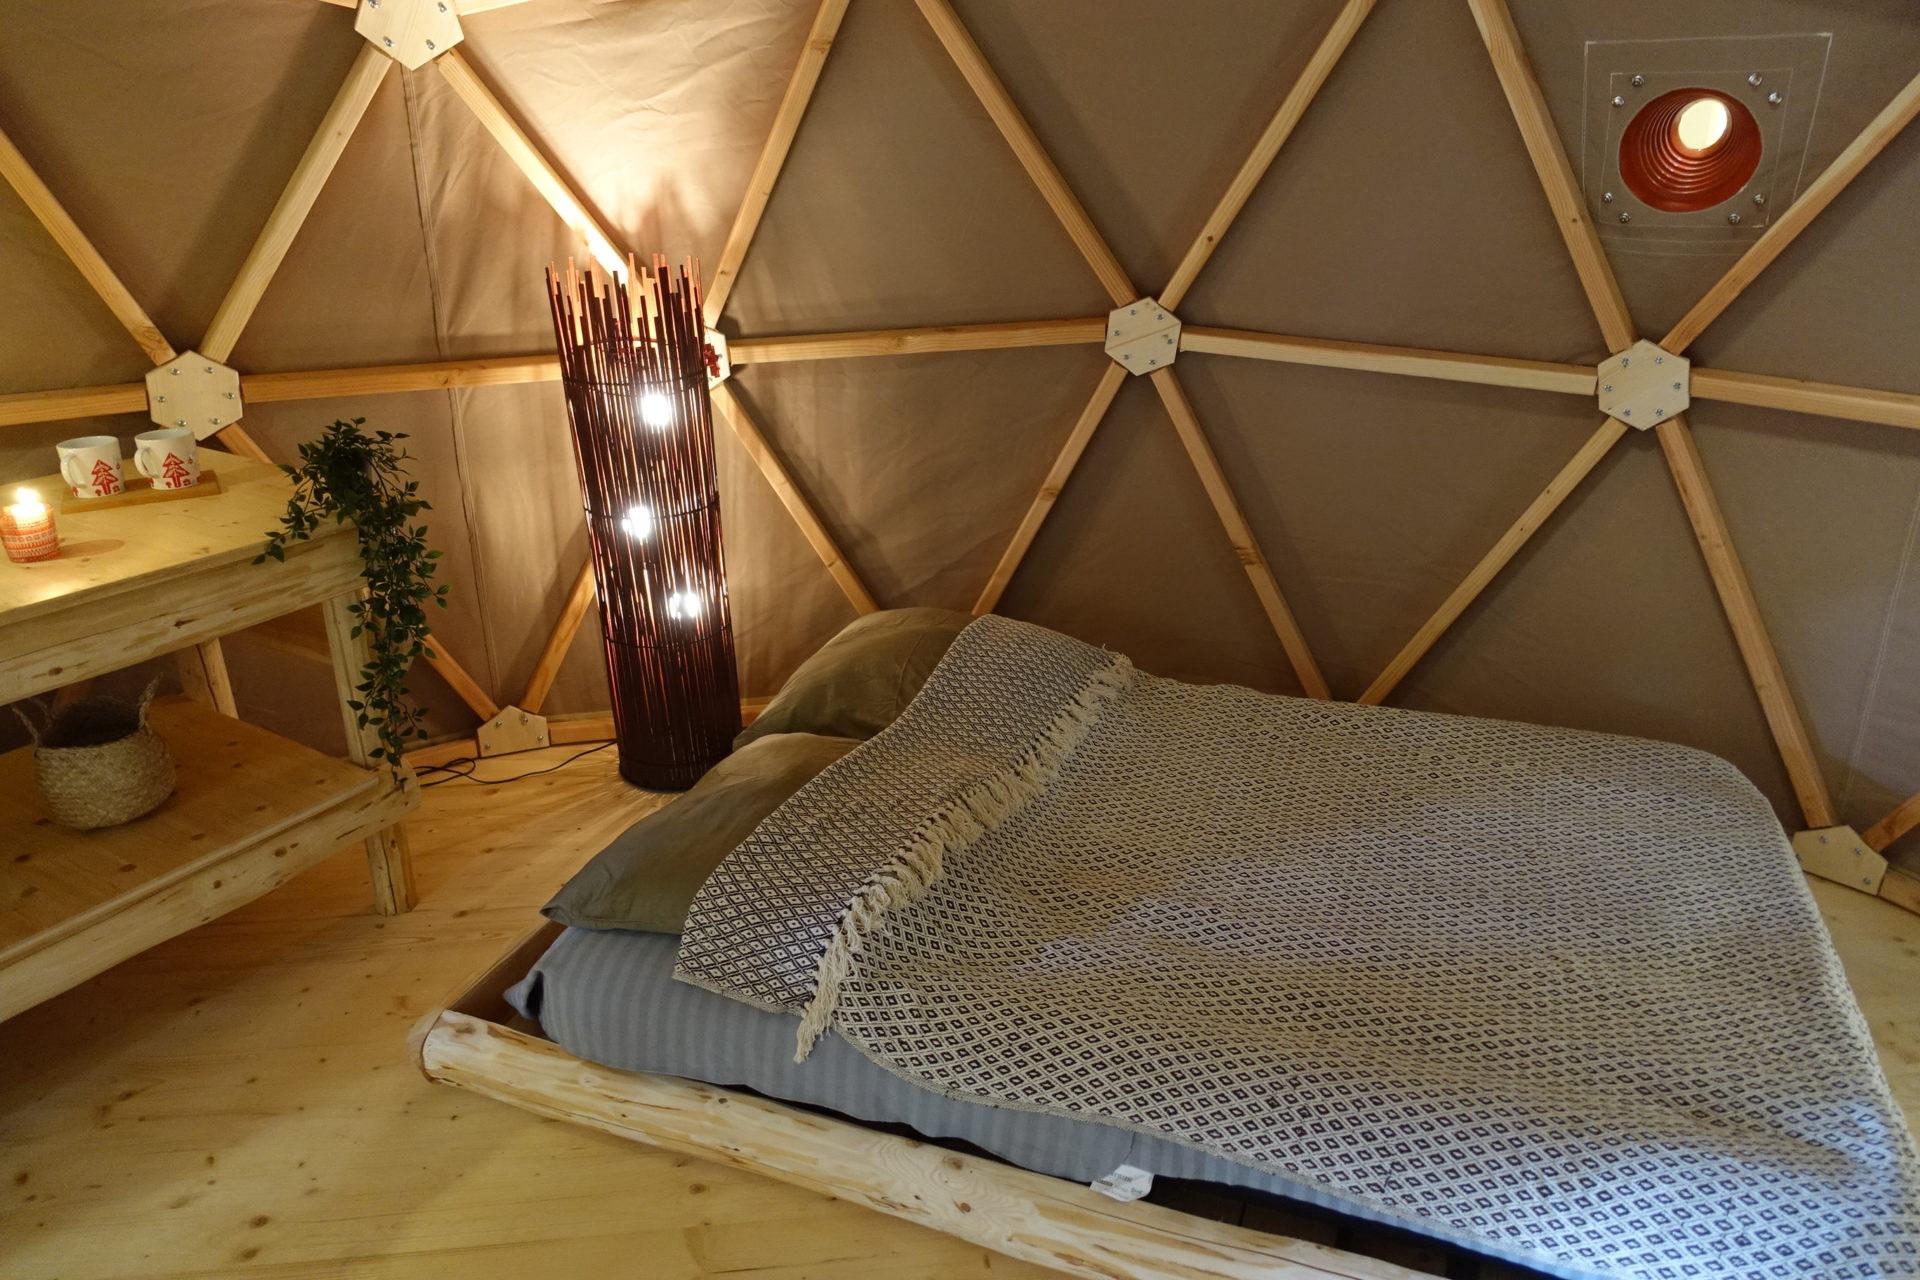 Salon SETT 2019:                                                                               Stand tipi-tente